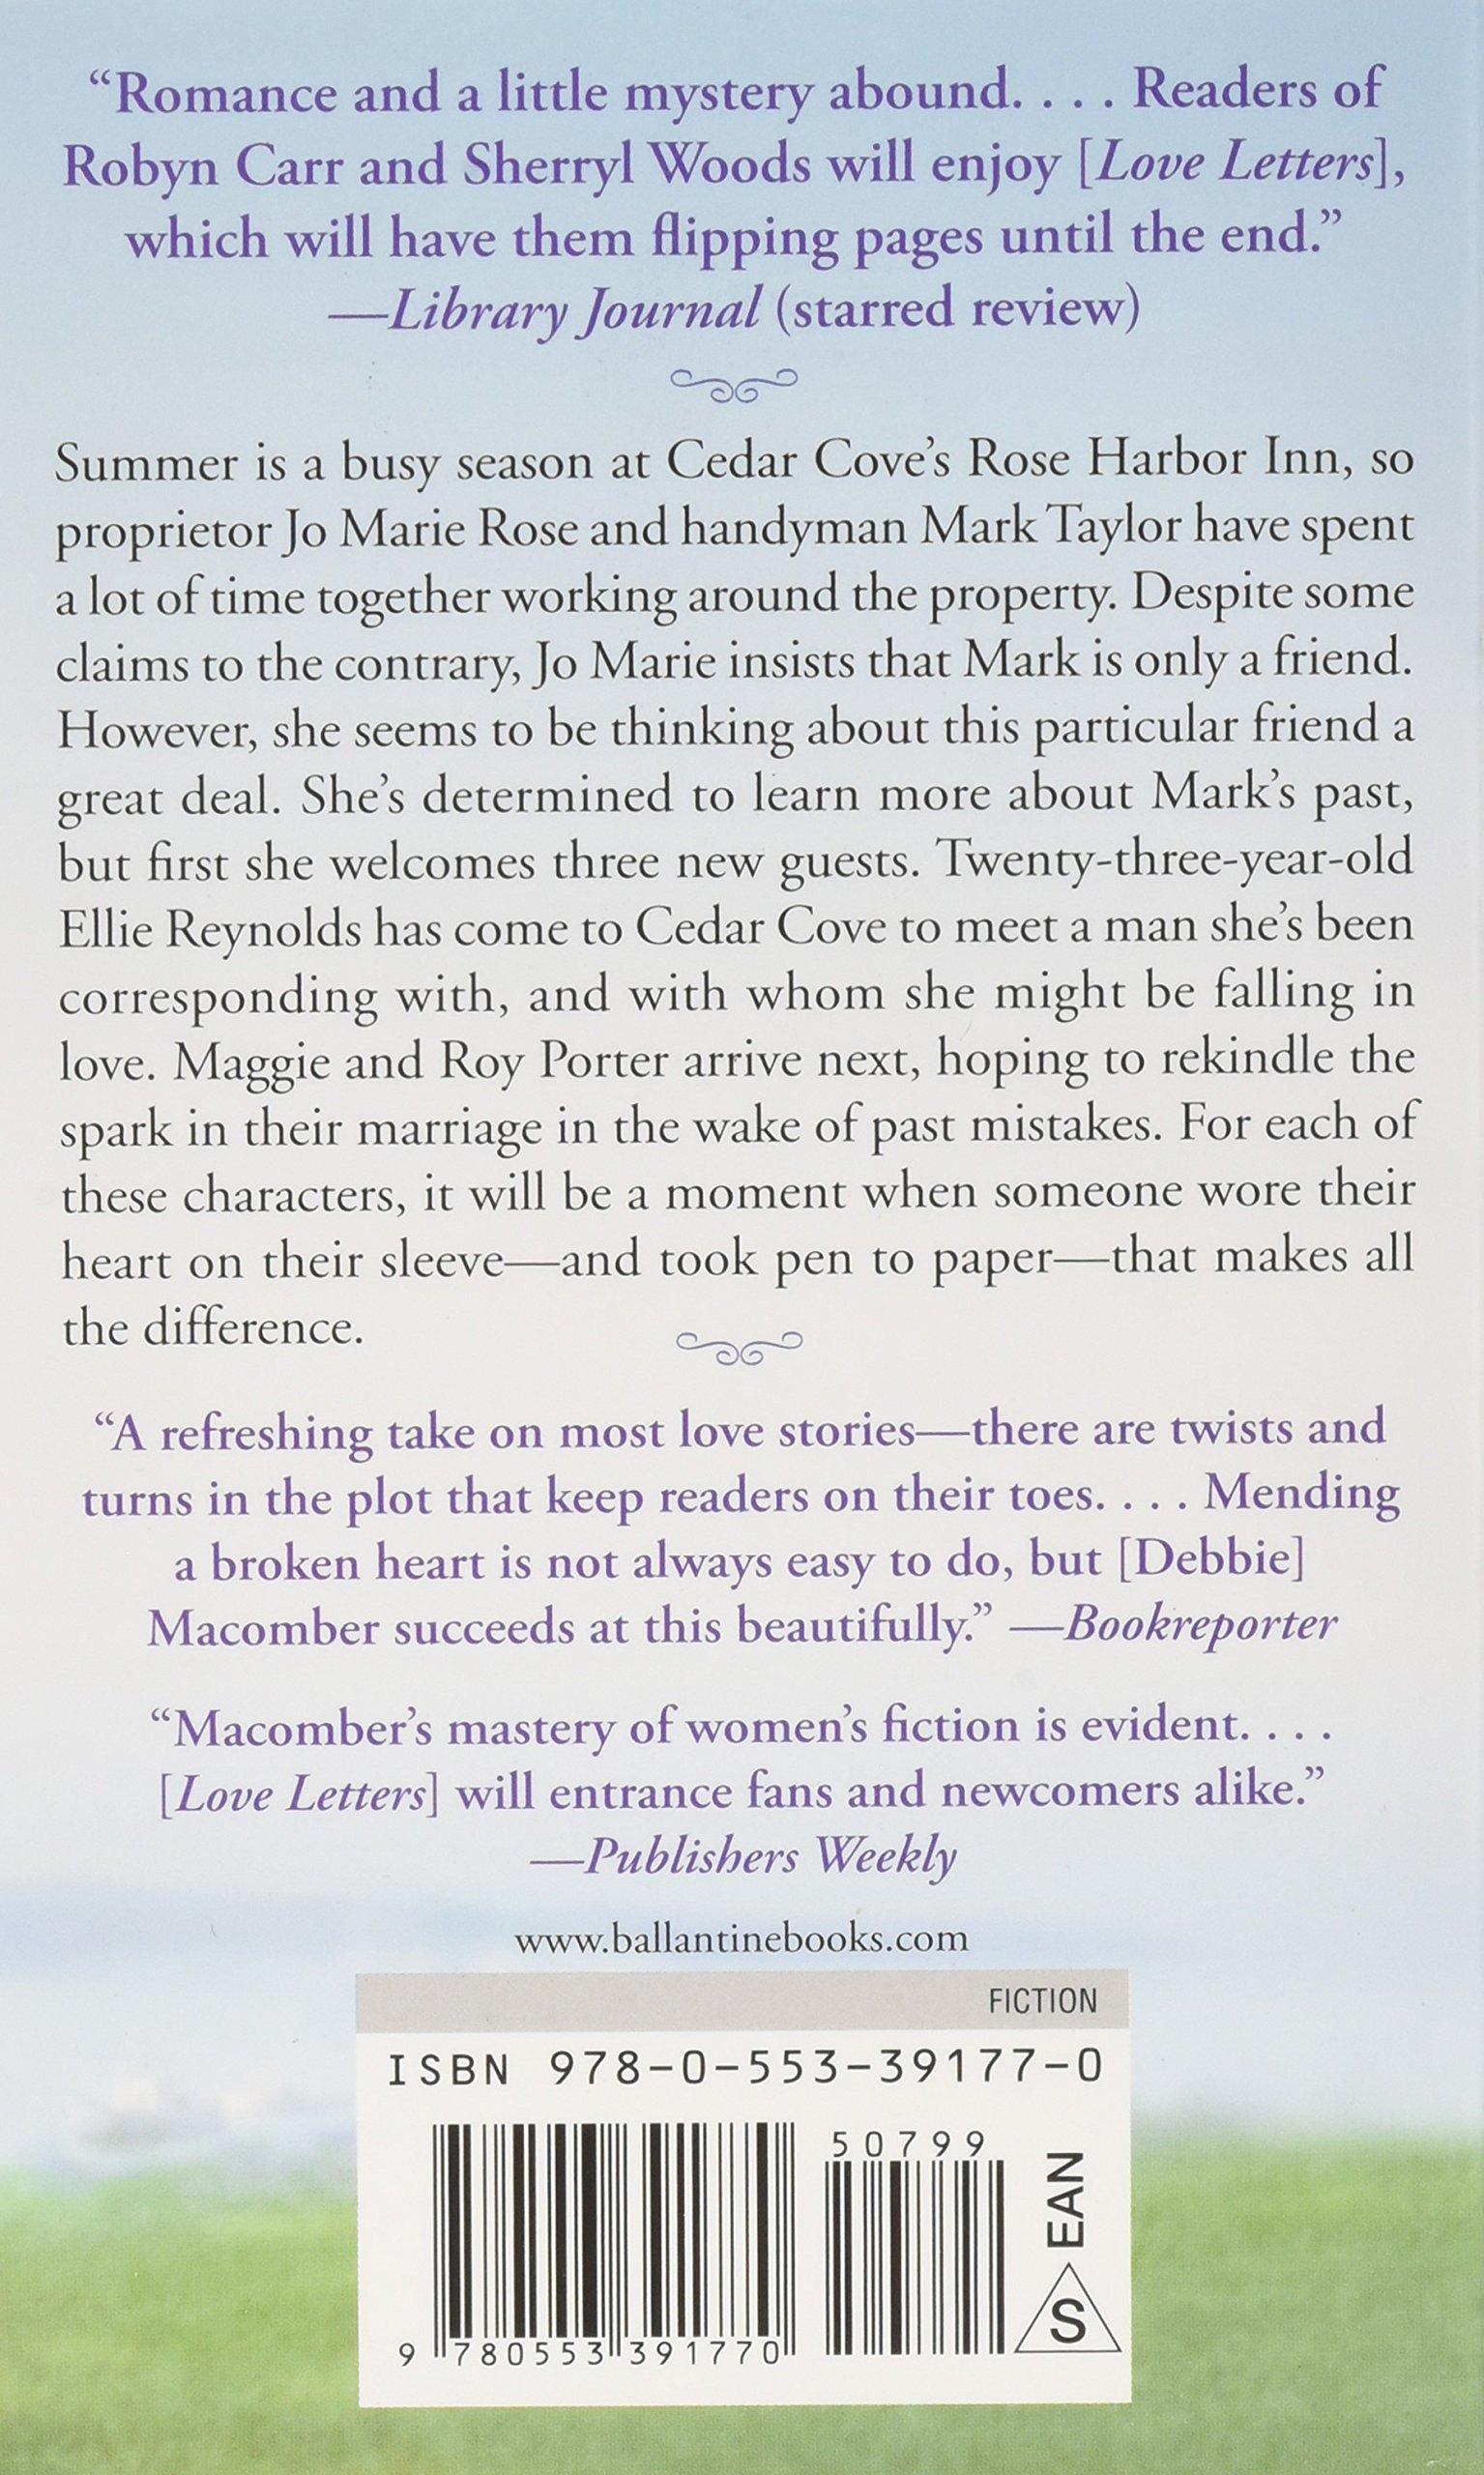 Love letters a rose harbor novel debbie macomber 9780553391770 love letters a rose harbor novel debbie macomber 9780553391770 amazon books spiritdancerdesigns Images